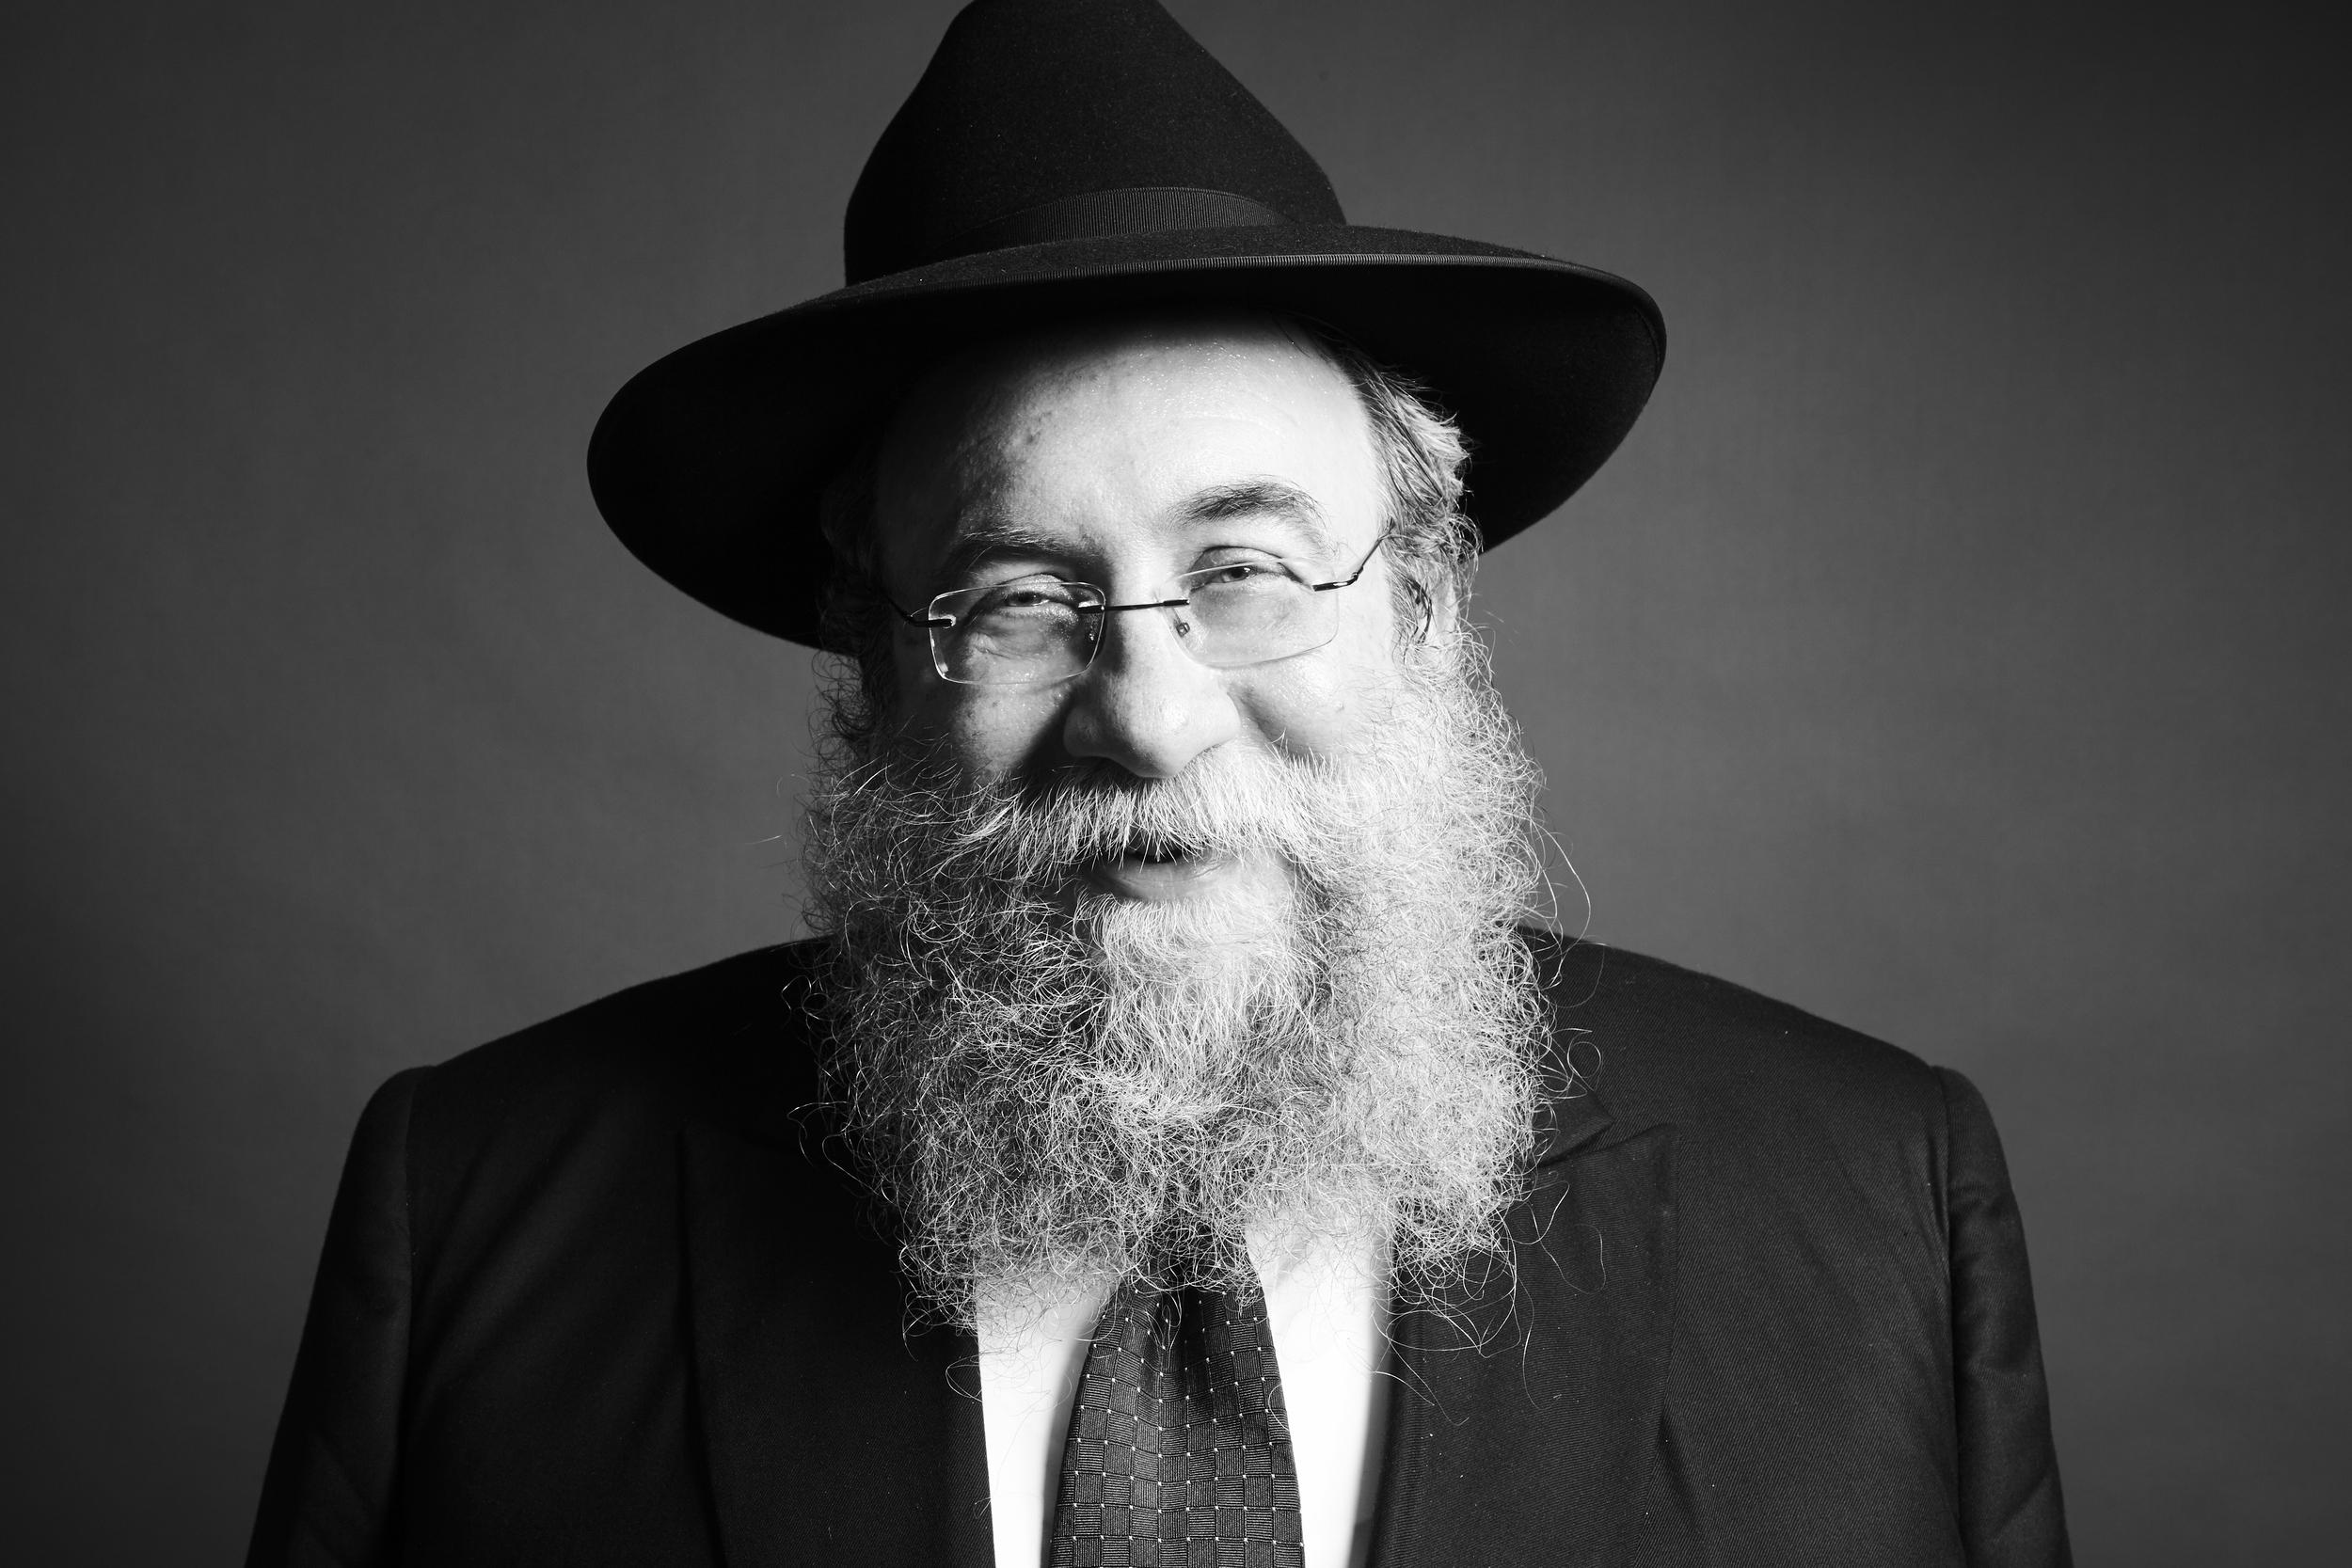 RABBI YISRAEL DEREN